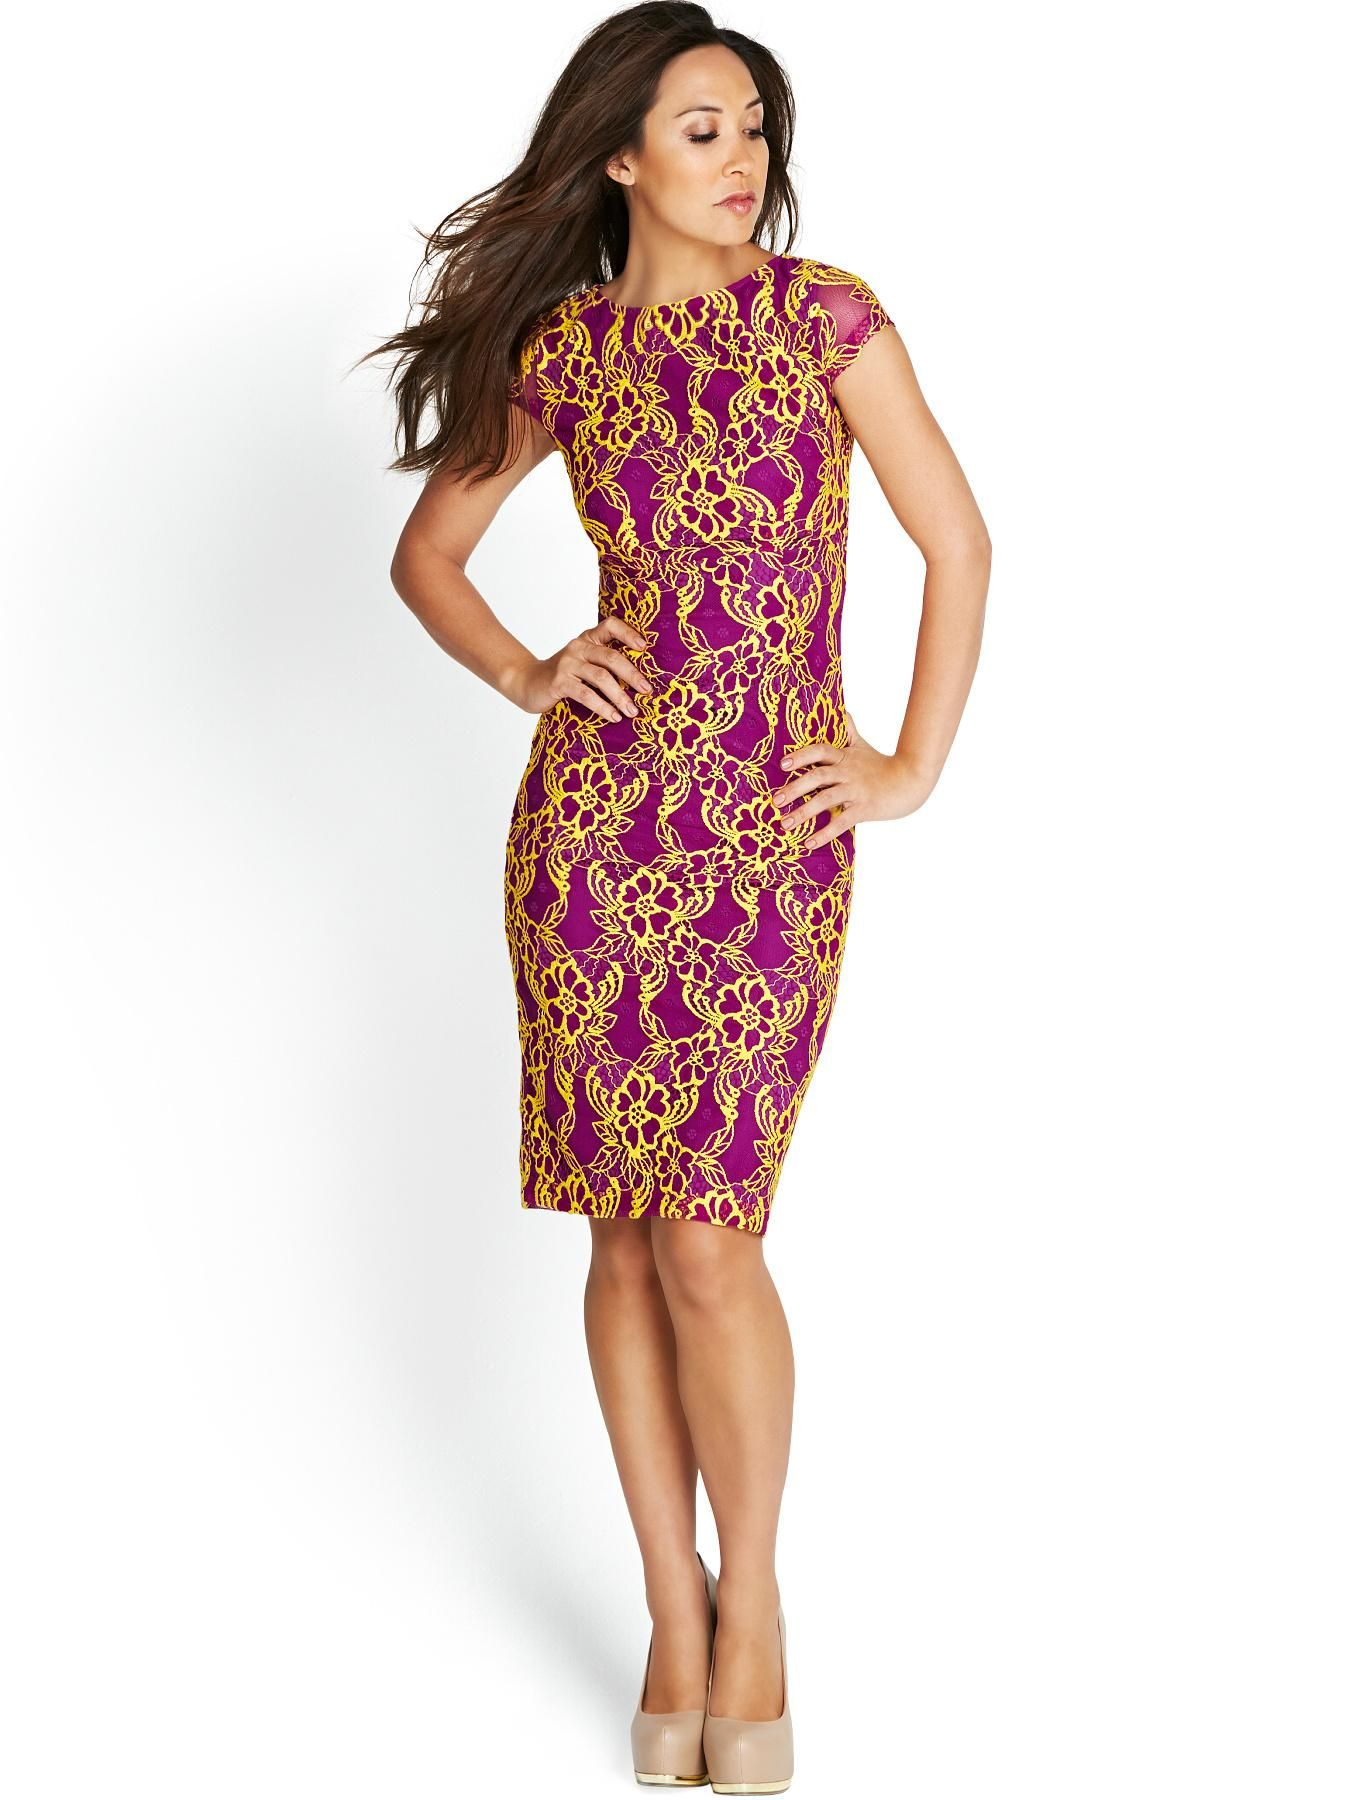 Myleene Kl Bright Lace Pencil Dress Purple Yellow Bodycon